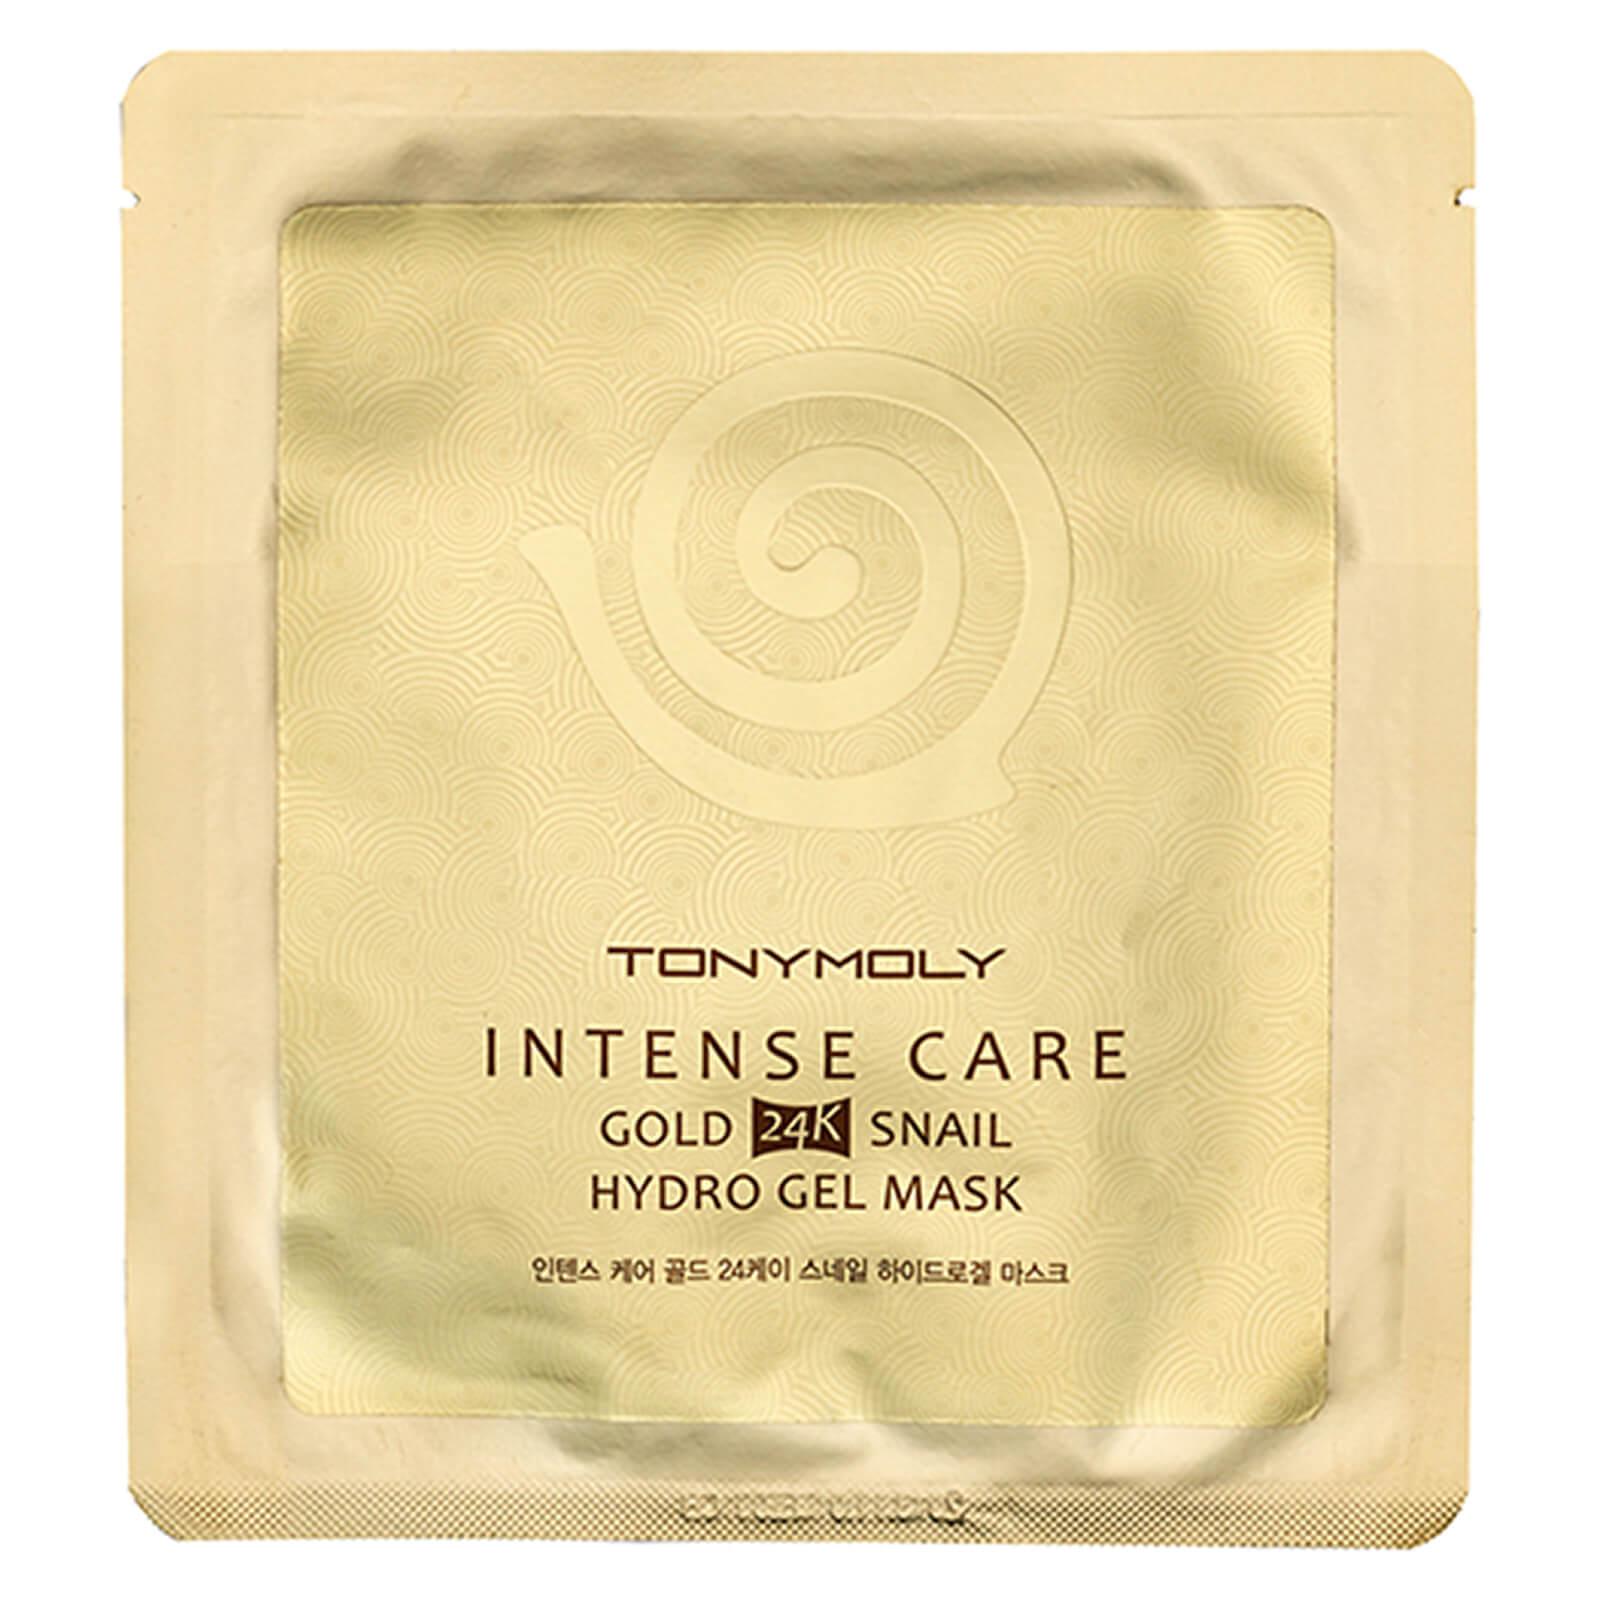 TONYMOLY - TONYMOLY Intense Care Snail Gold 24K Hydrogel Mask